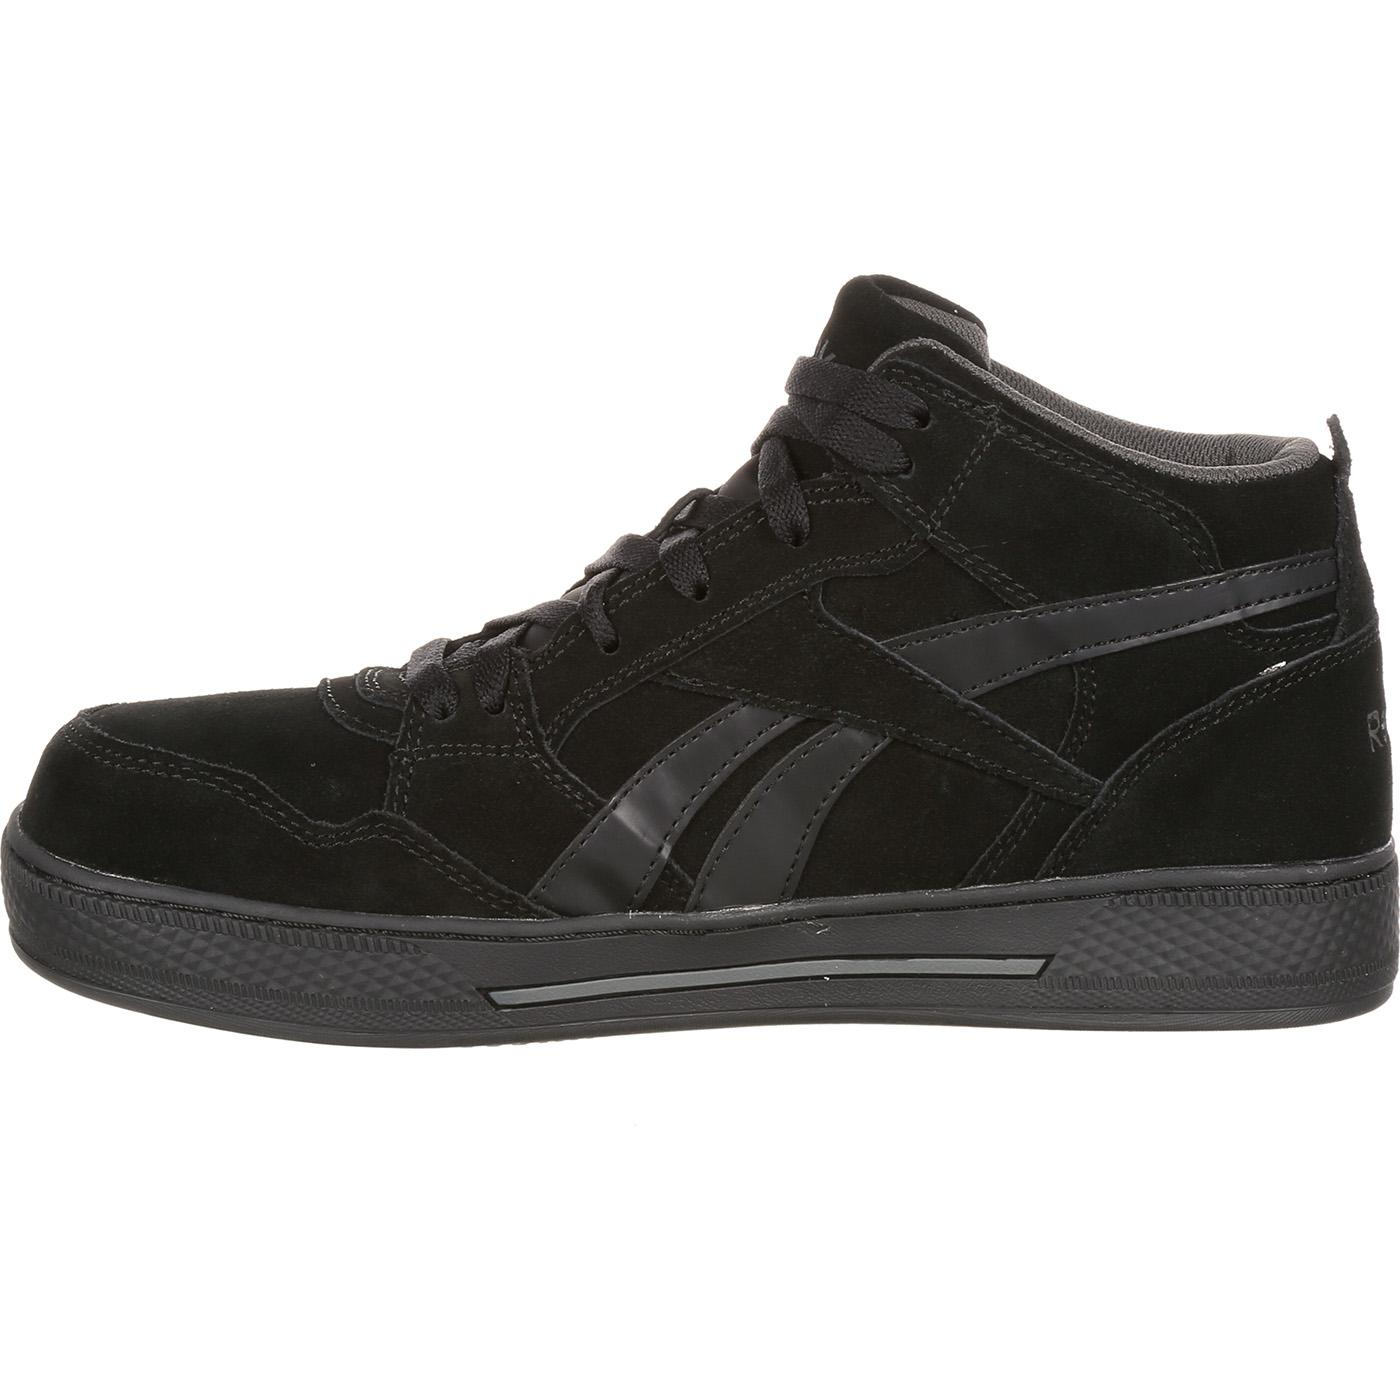 0ab86094863 Reebok Dayod Composite Toe Work Skate ShoeReebok Dayod Composite Toe Work  Skate Shoe